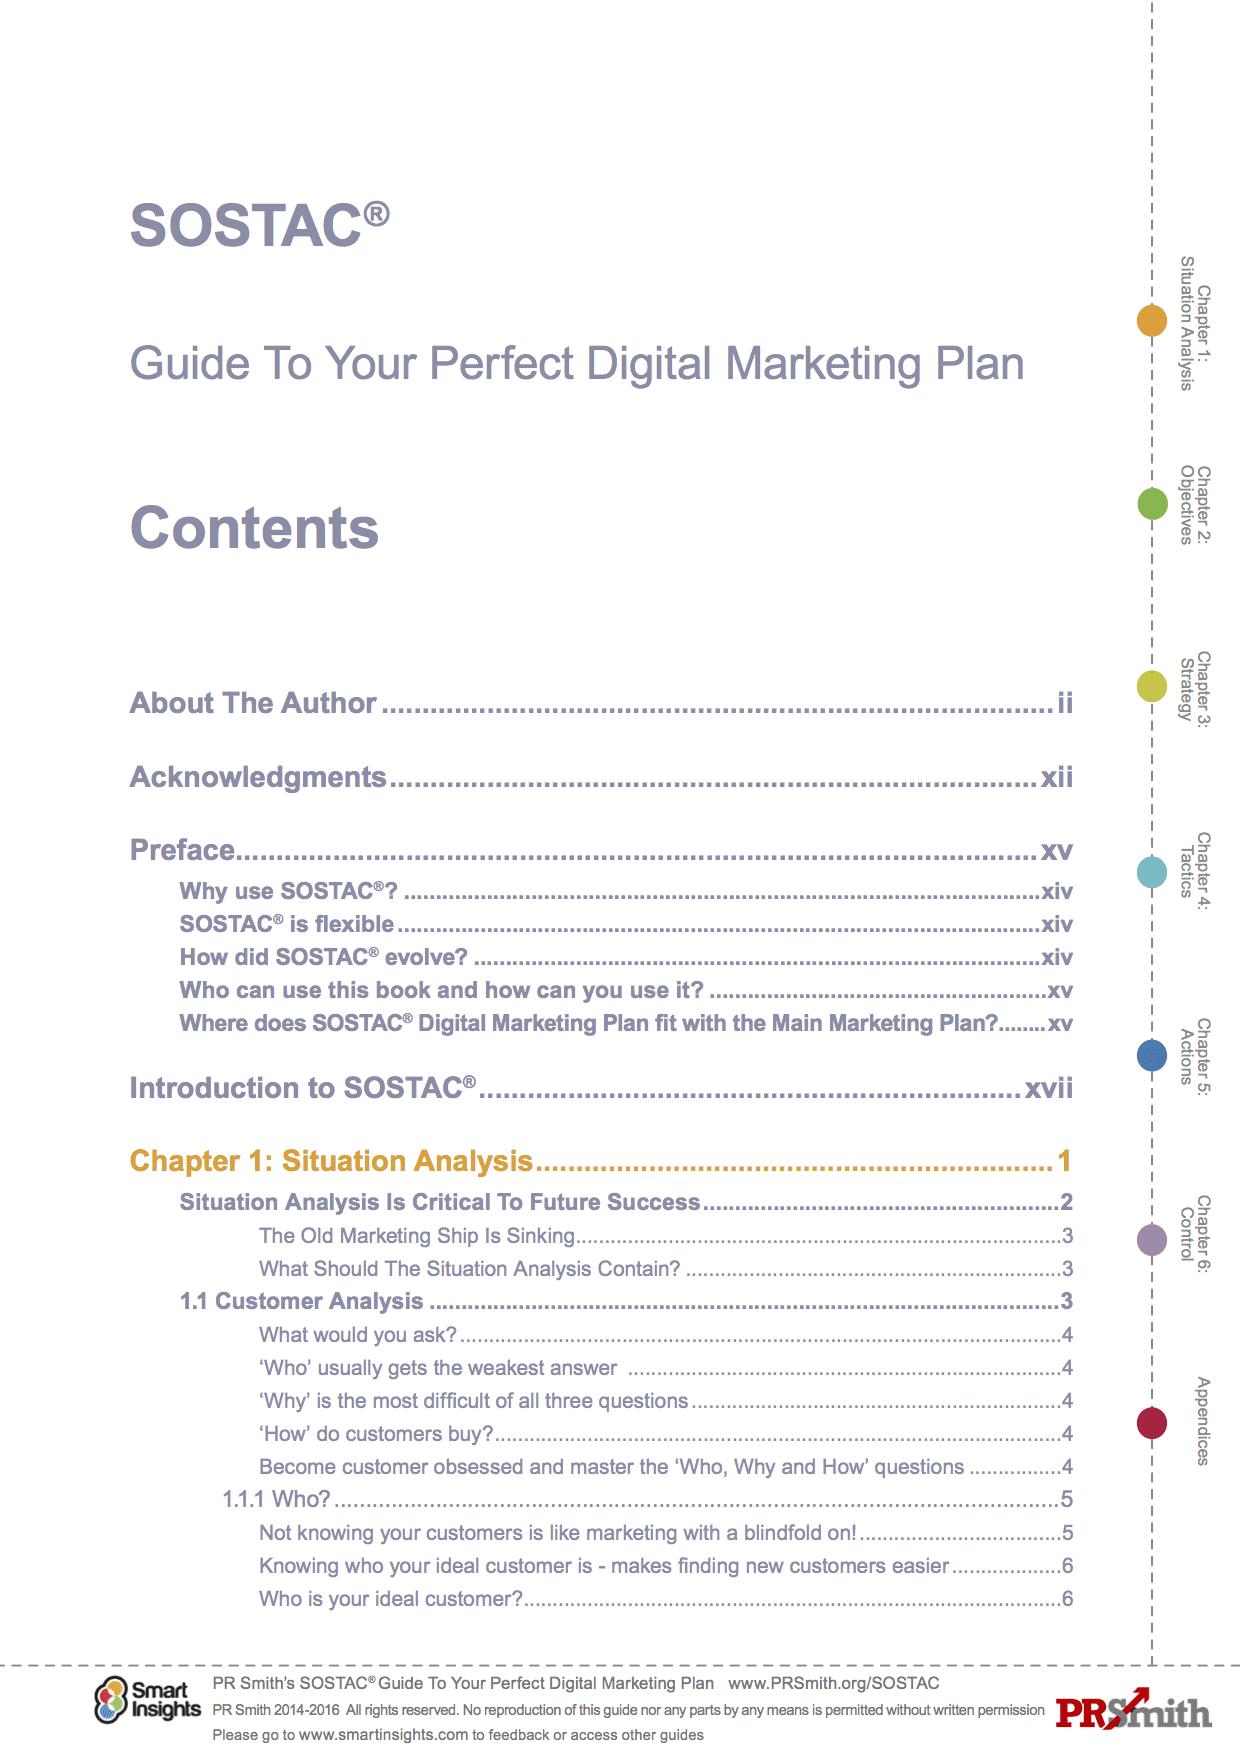 SOSTAC® Digital Marketing Planning Guide